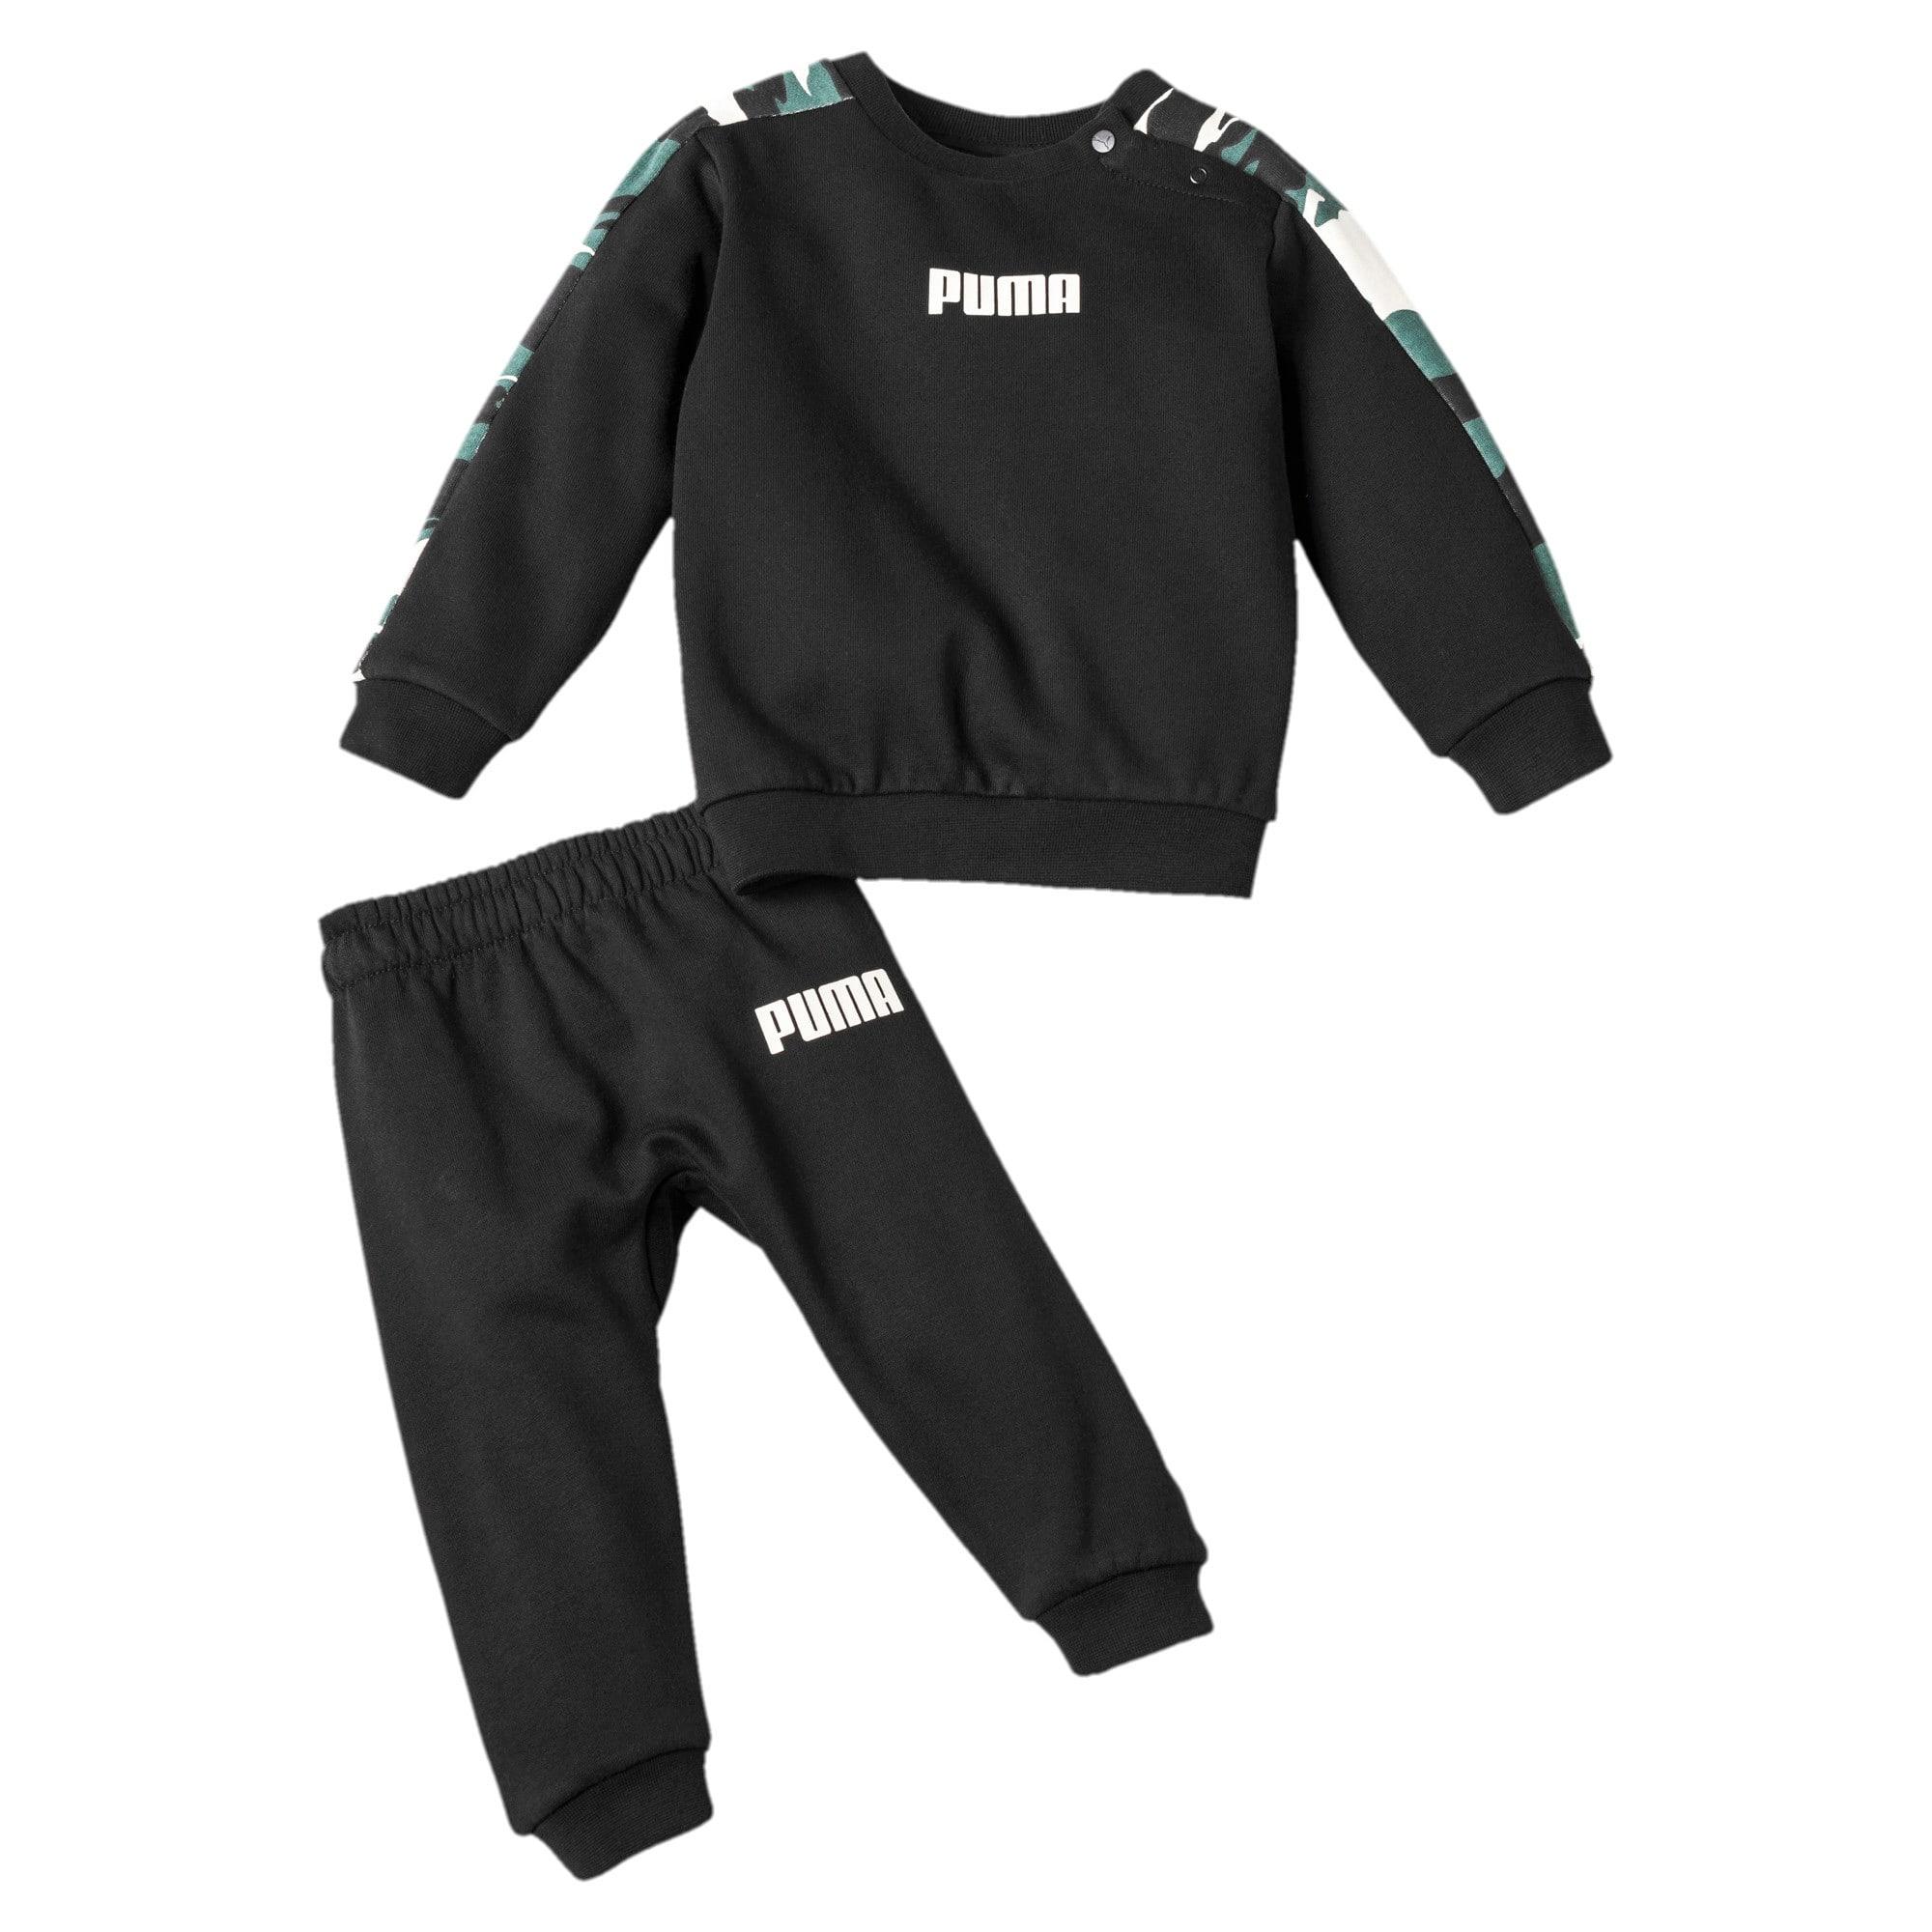 Thumbnail 1 of Street Wear T7 Babies' Jogger Set, Puma Black, medium